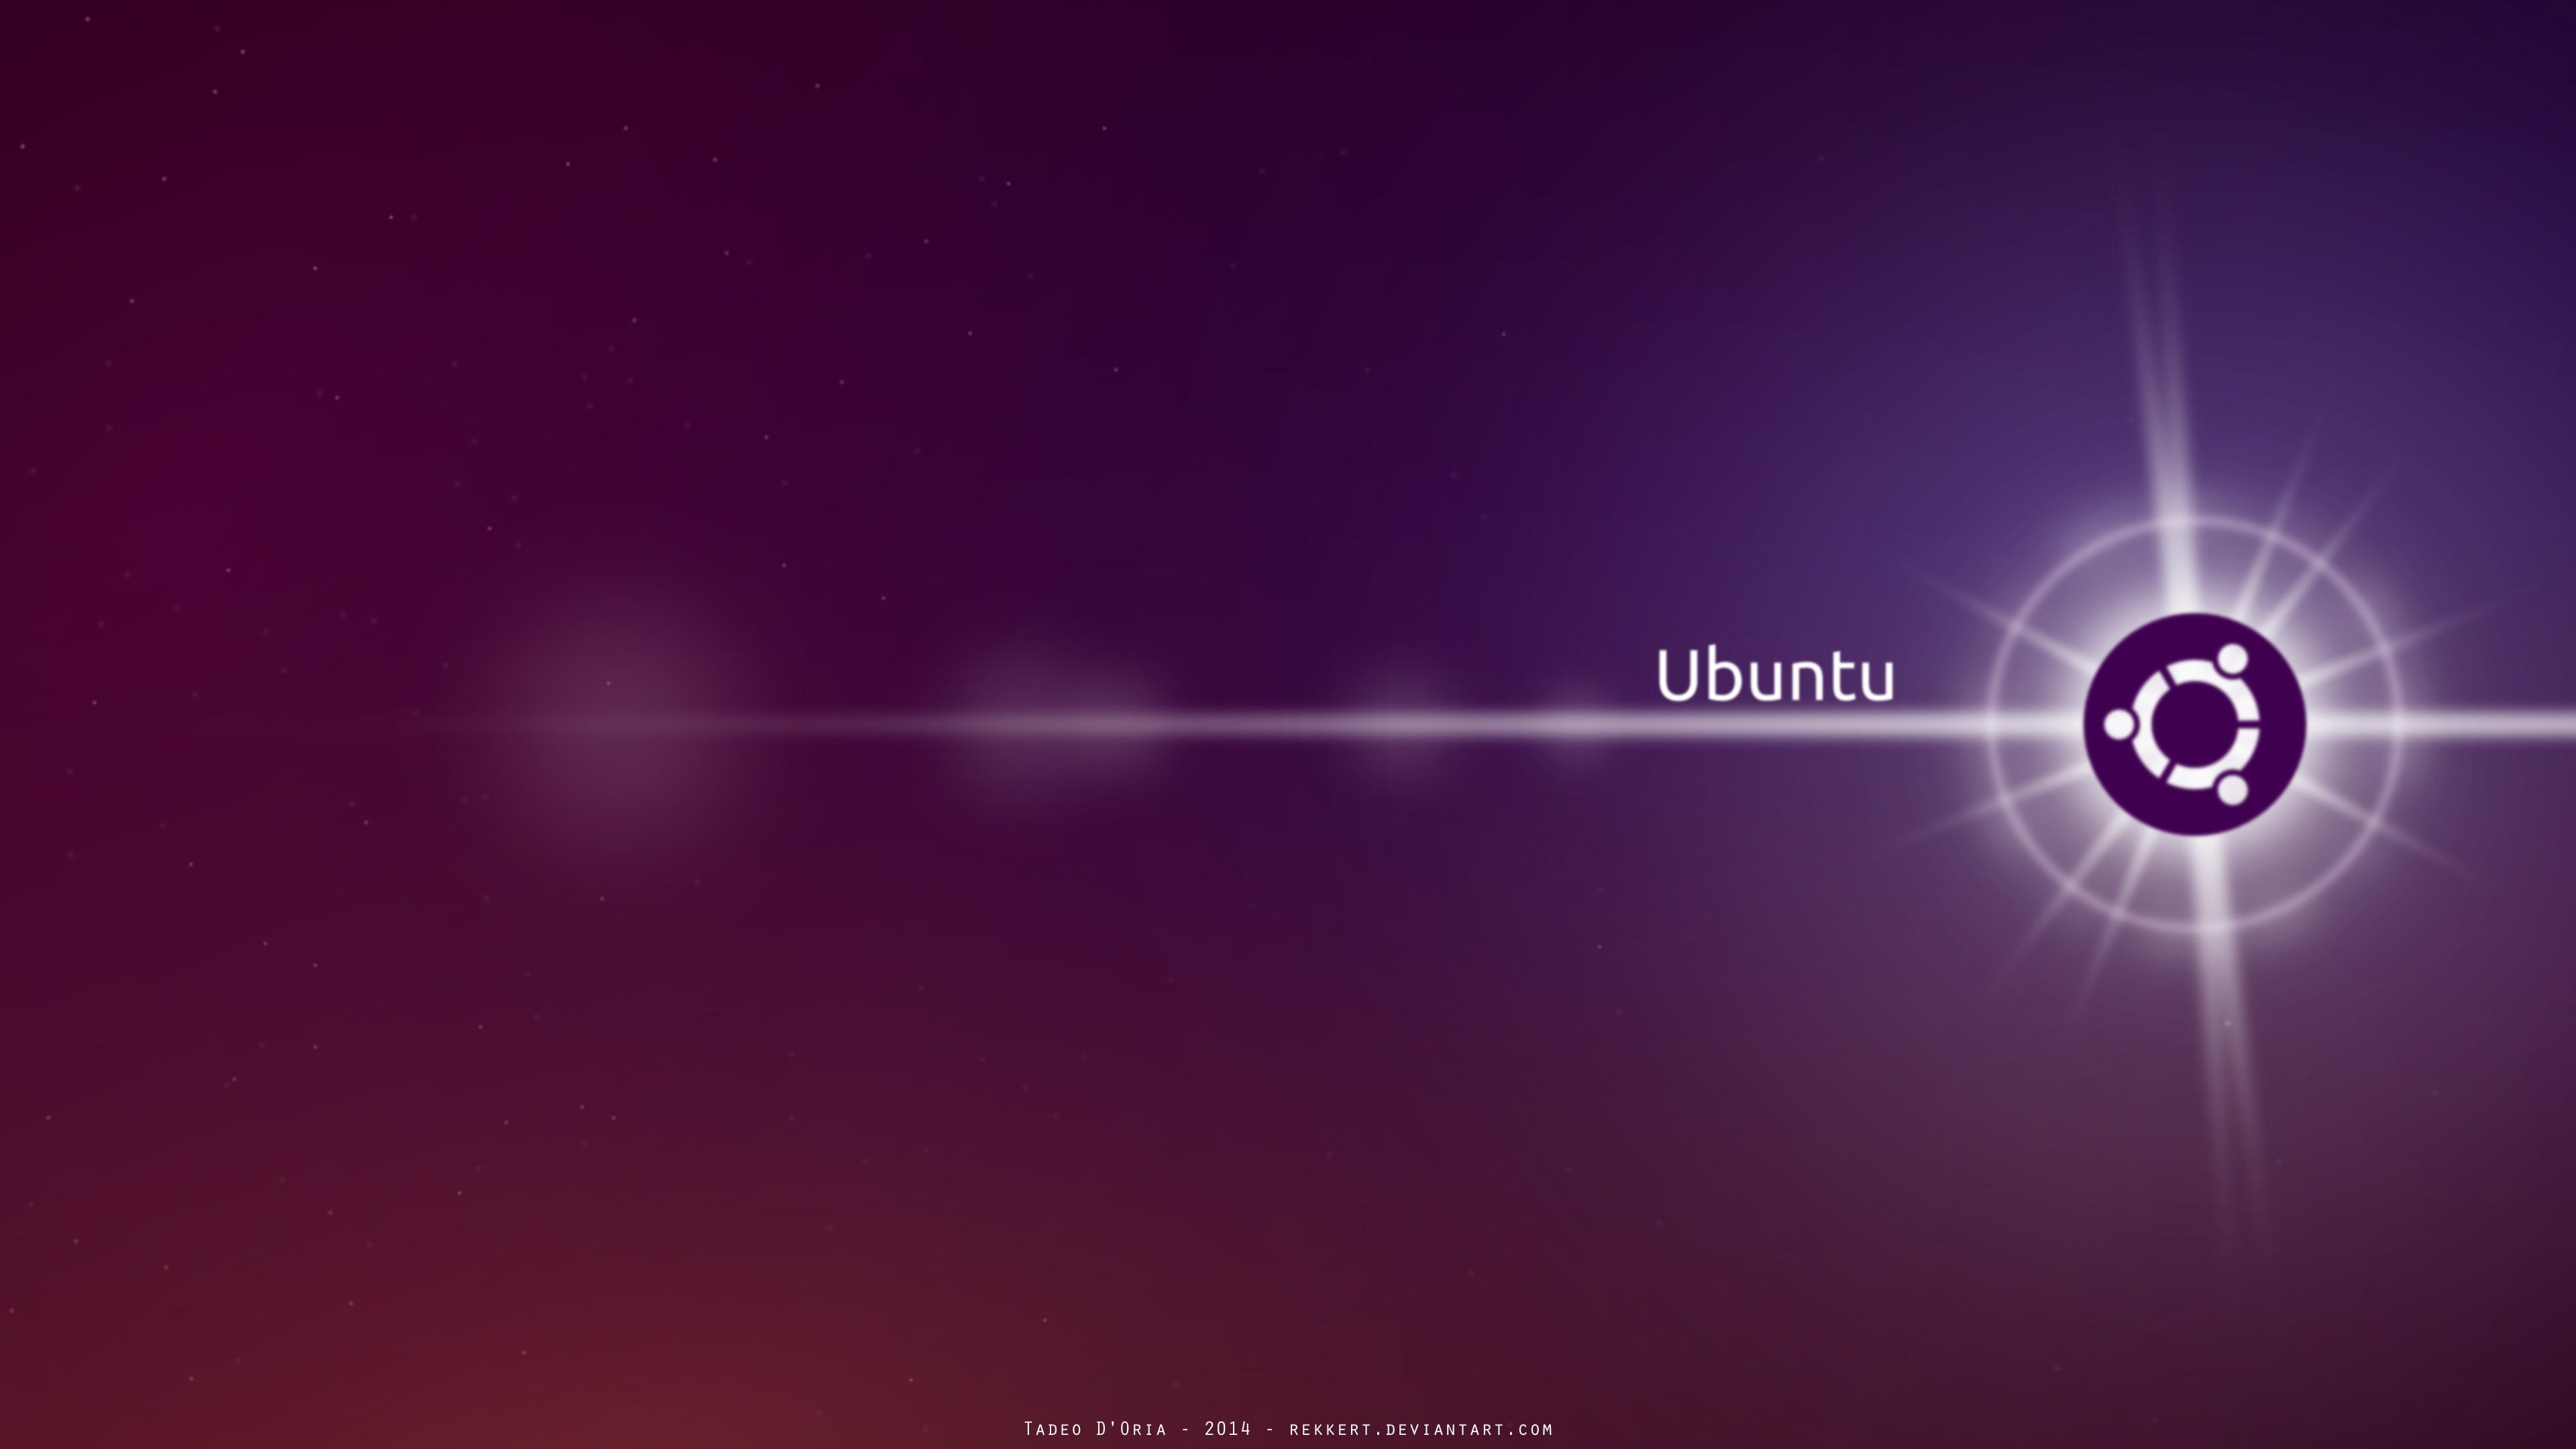 Ubuntu Wallpaper By Rekkert On Deviantart